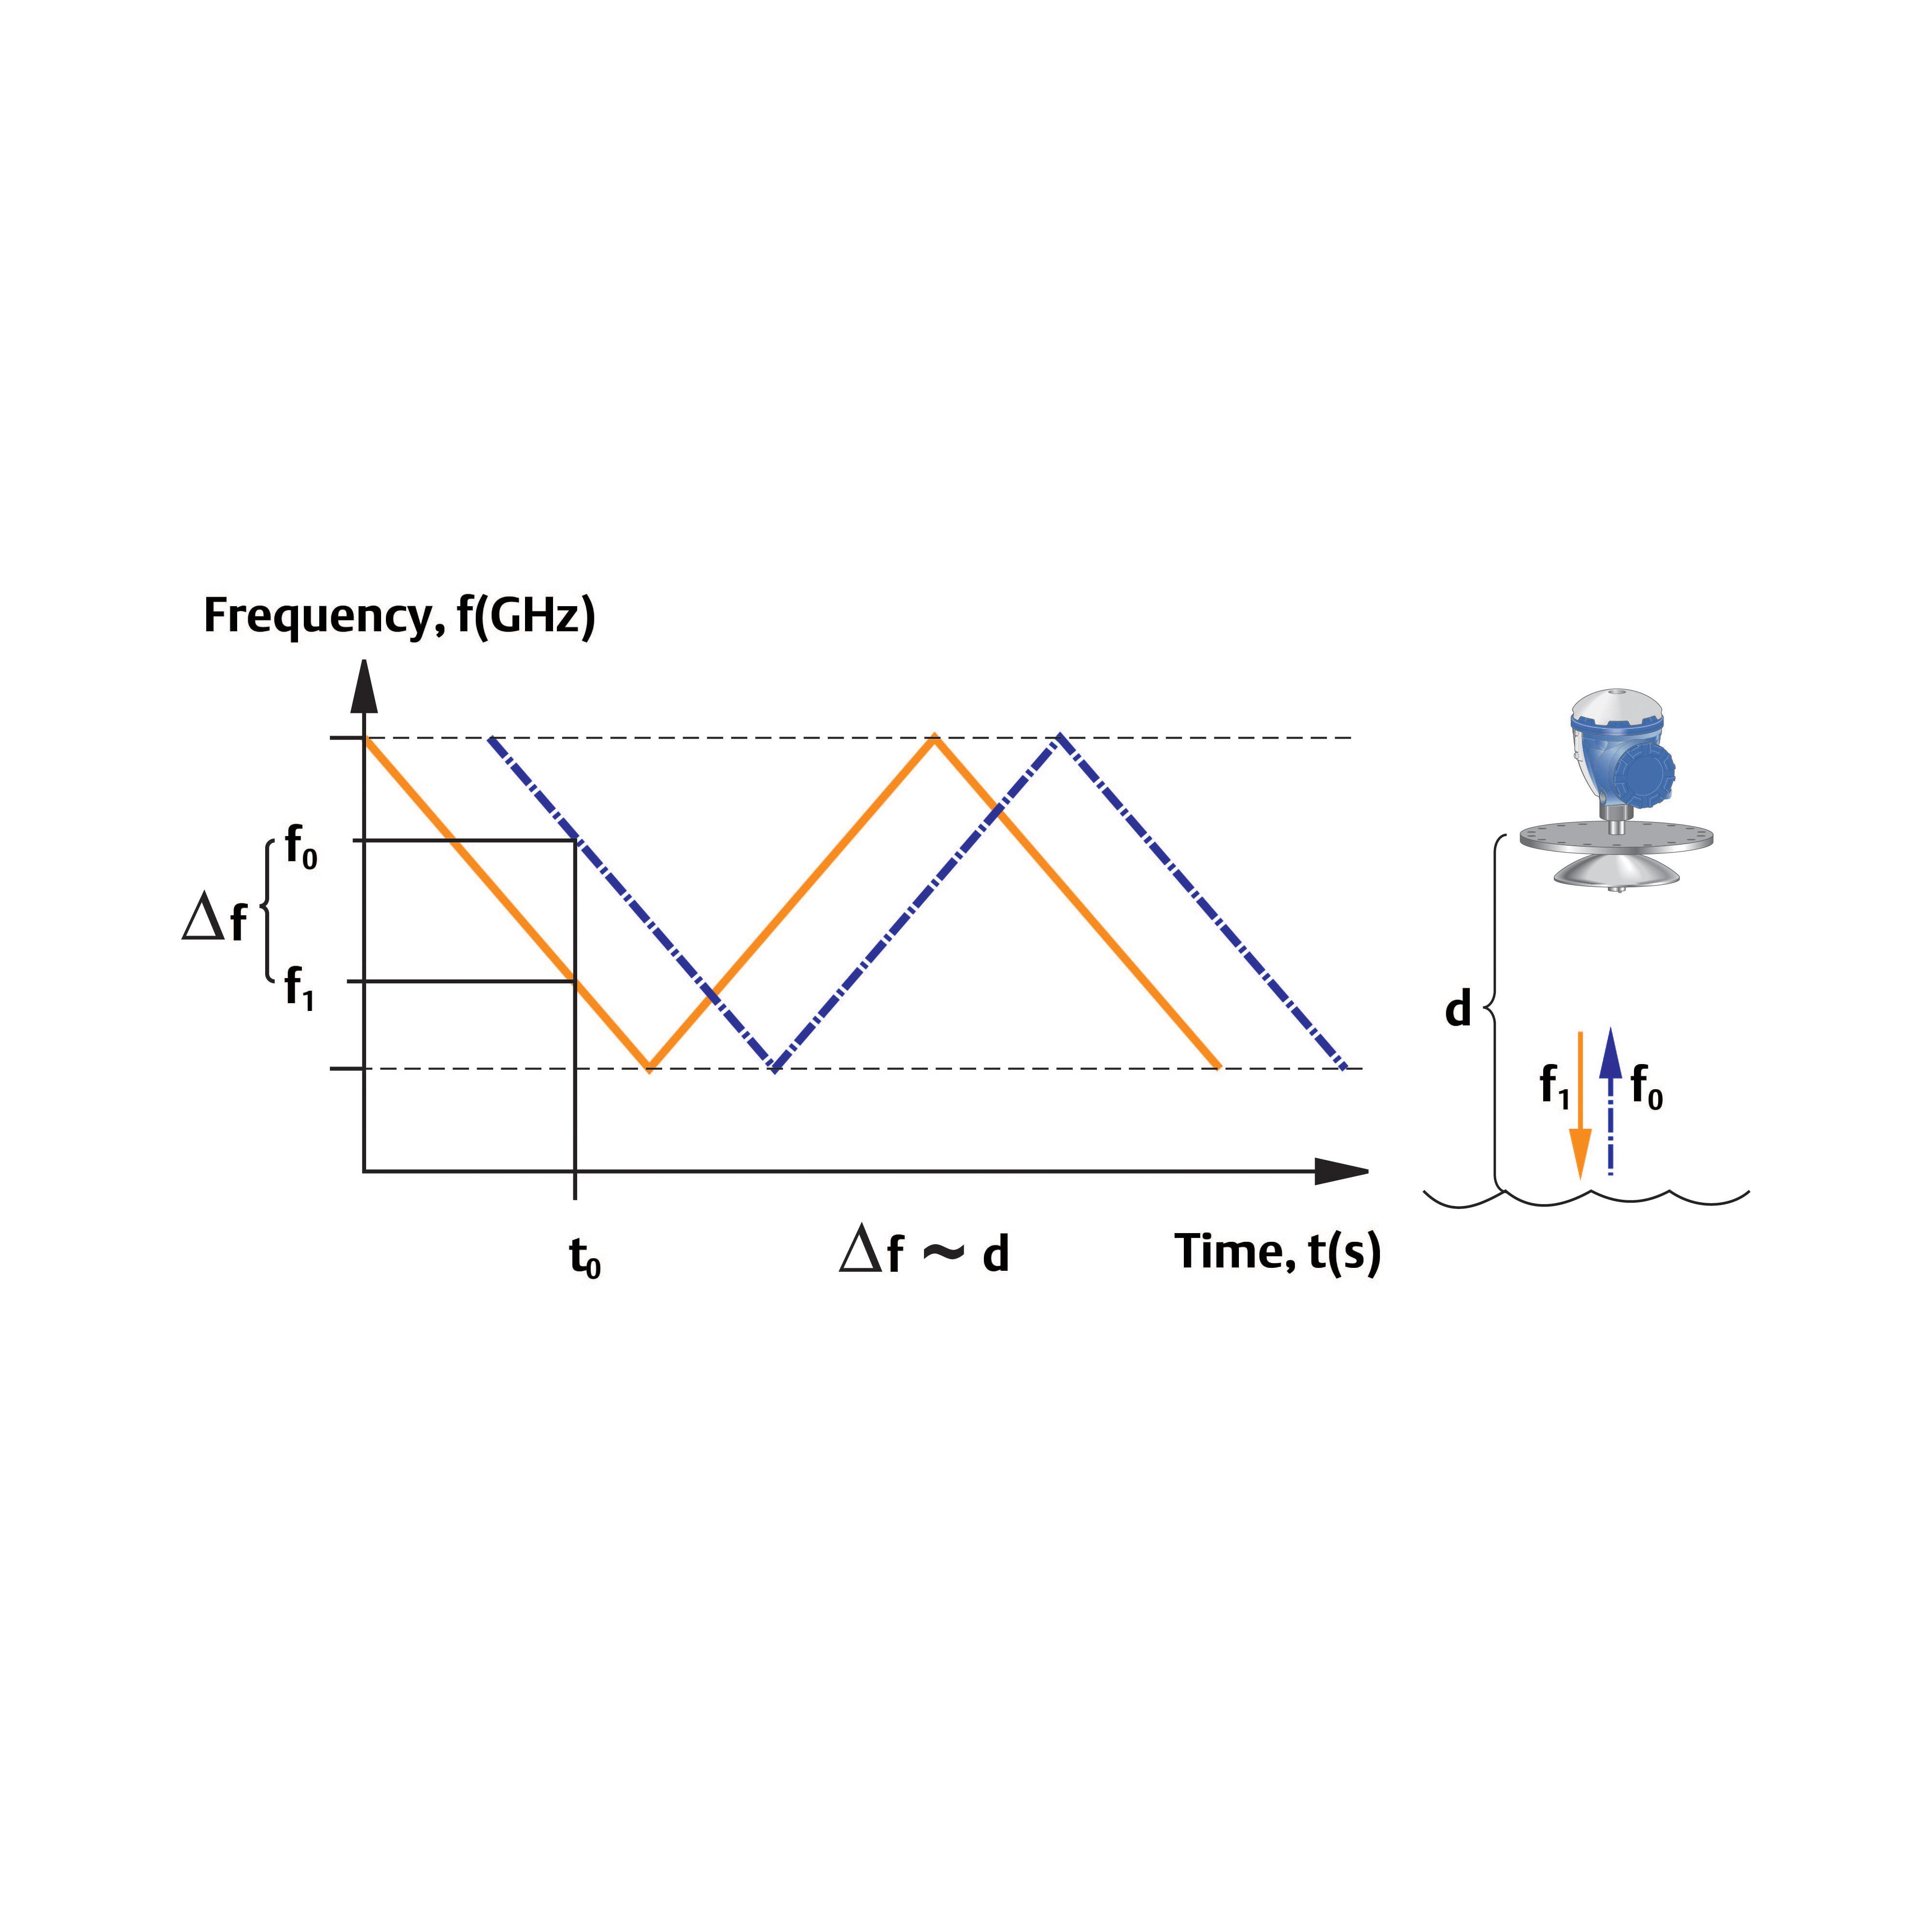 About Rosemount 5900S Radar Level Gauge | Emerson CA on ramsey wiring diagram, barrett wiring diagram, regal wiring diagram, wadena wiring diagram, becker wiring diagram, fairmont wiring diagram, harmony wiring diagram, walker wiring diagram,